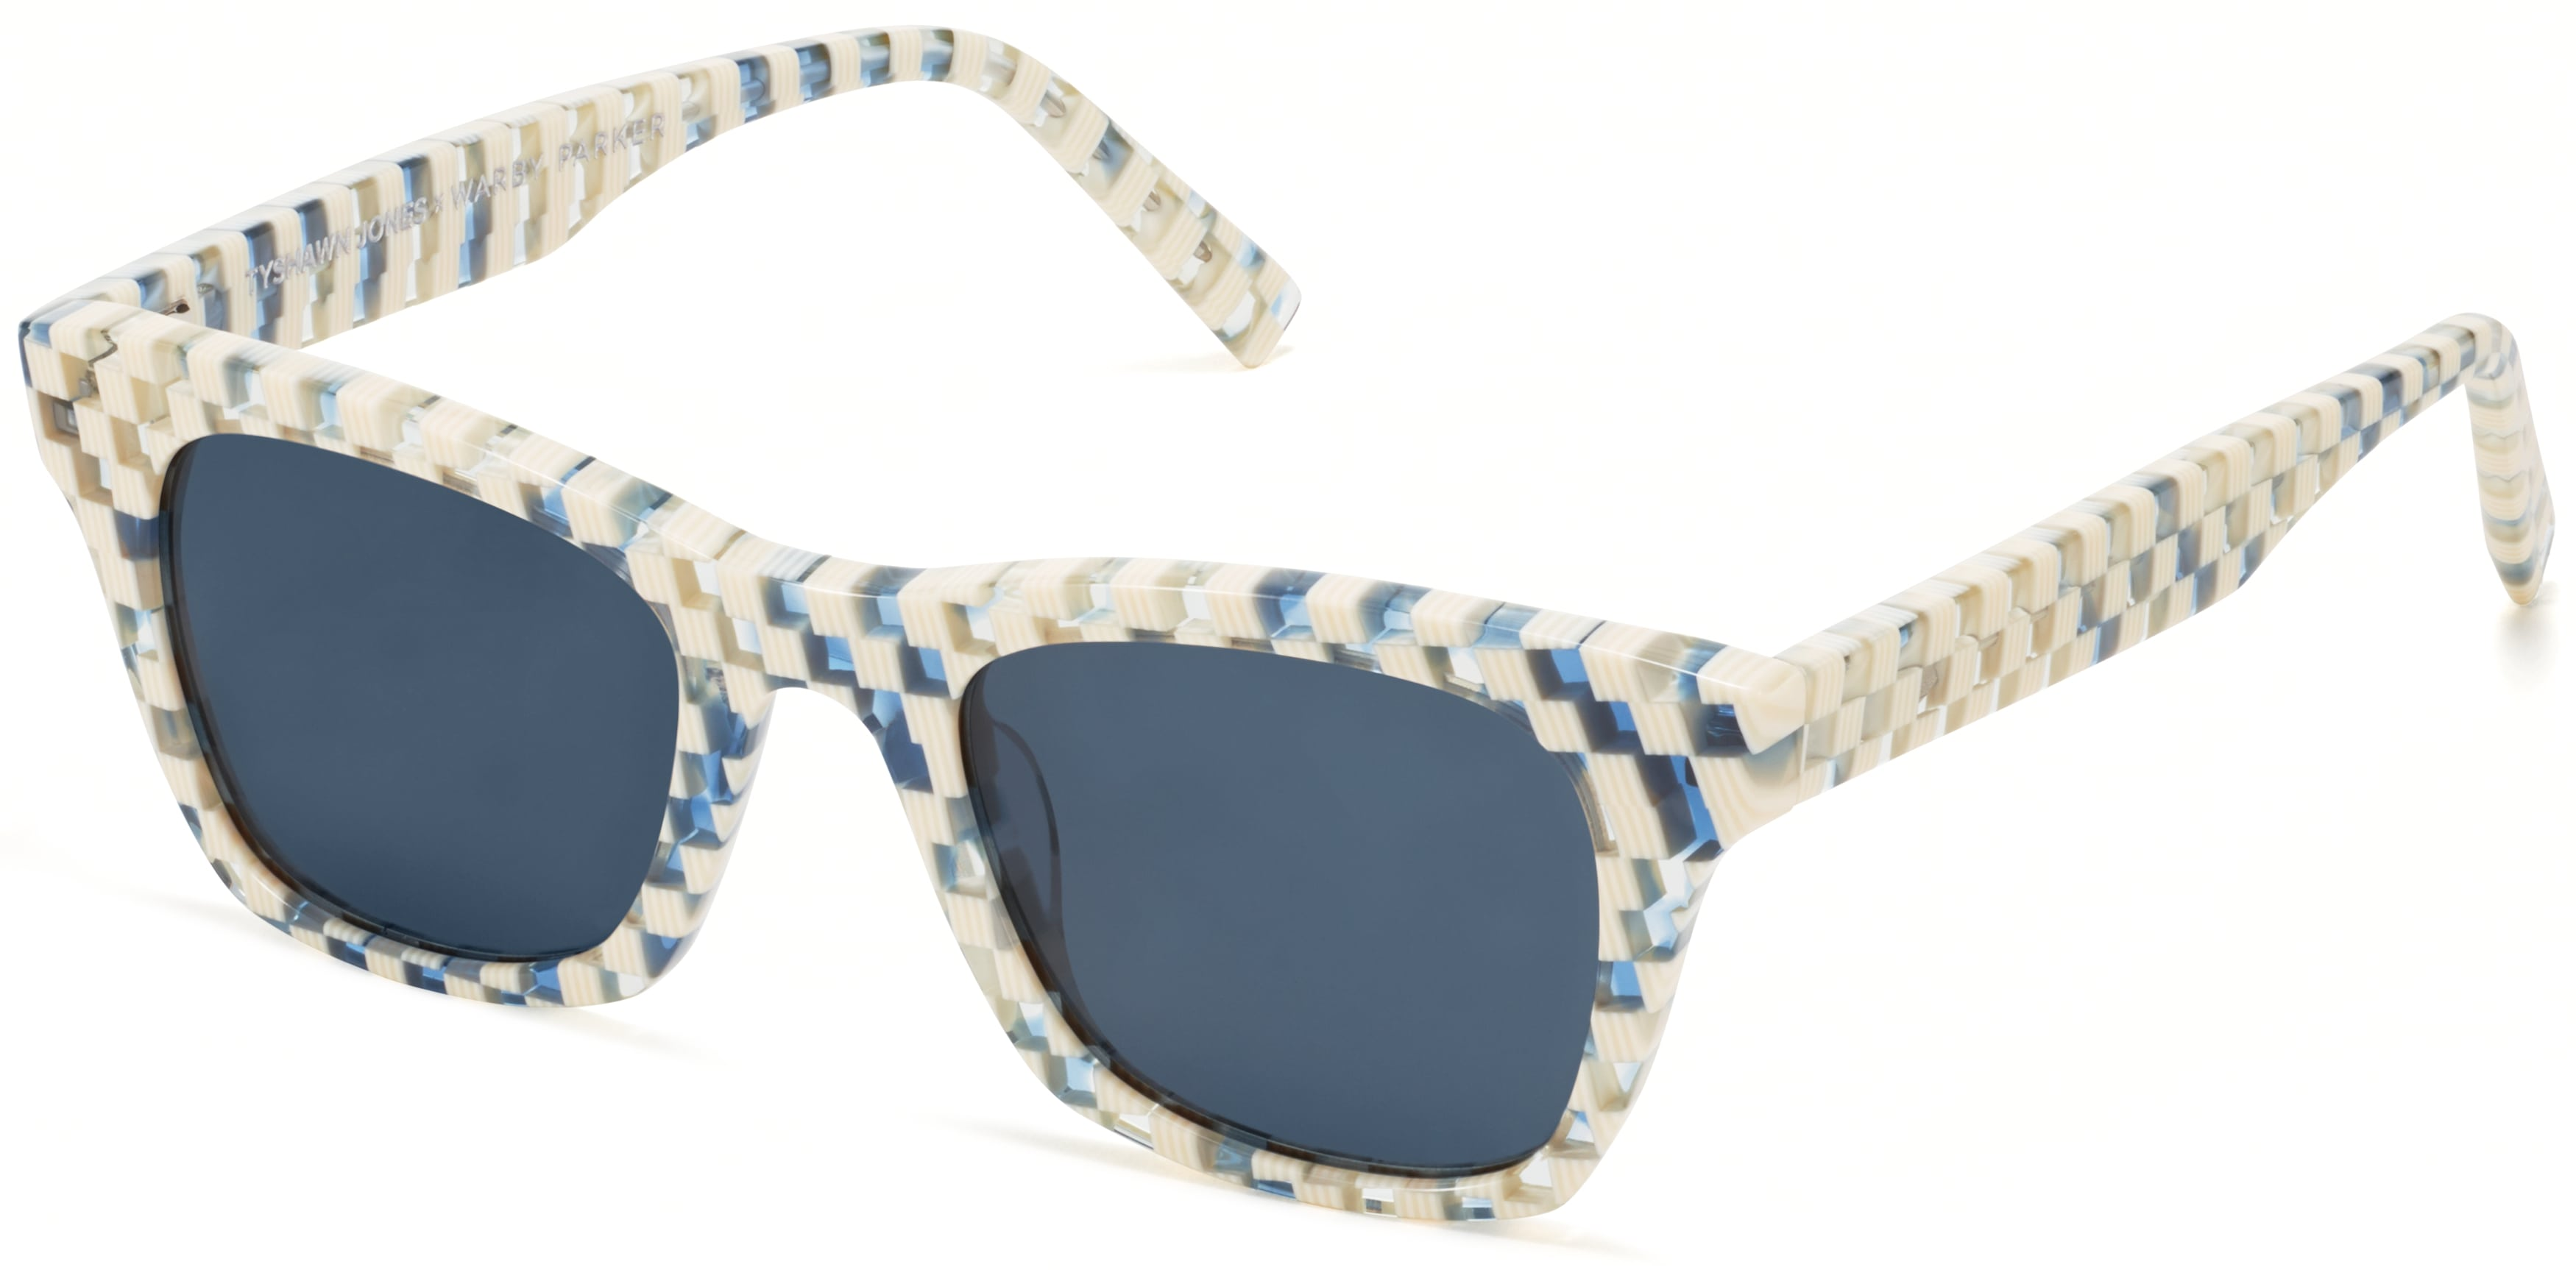 Warby Parker Harris sunglasses, trendy glasses for men